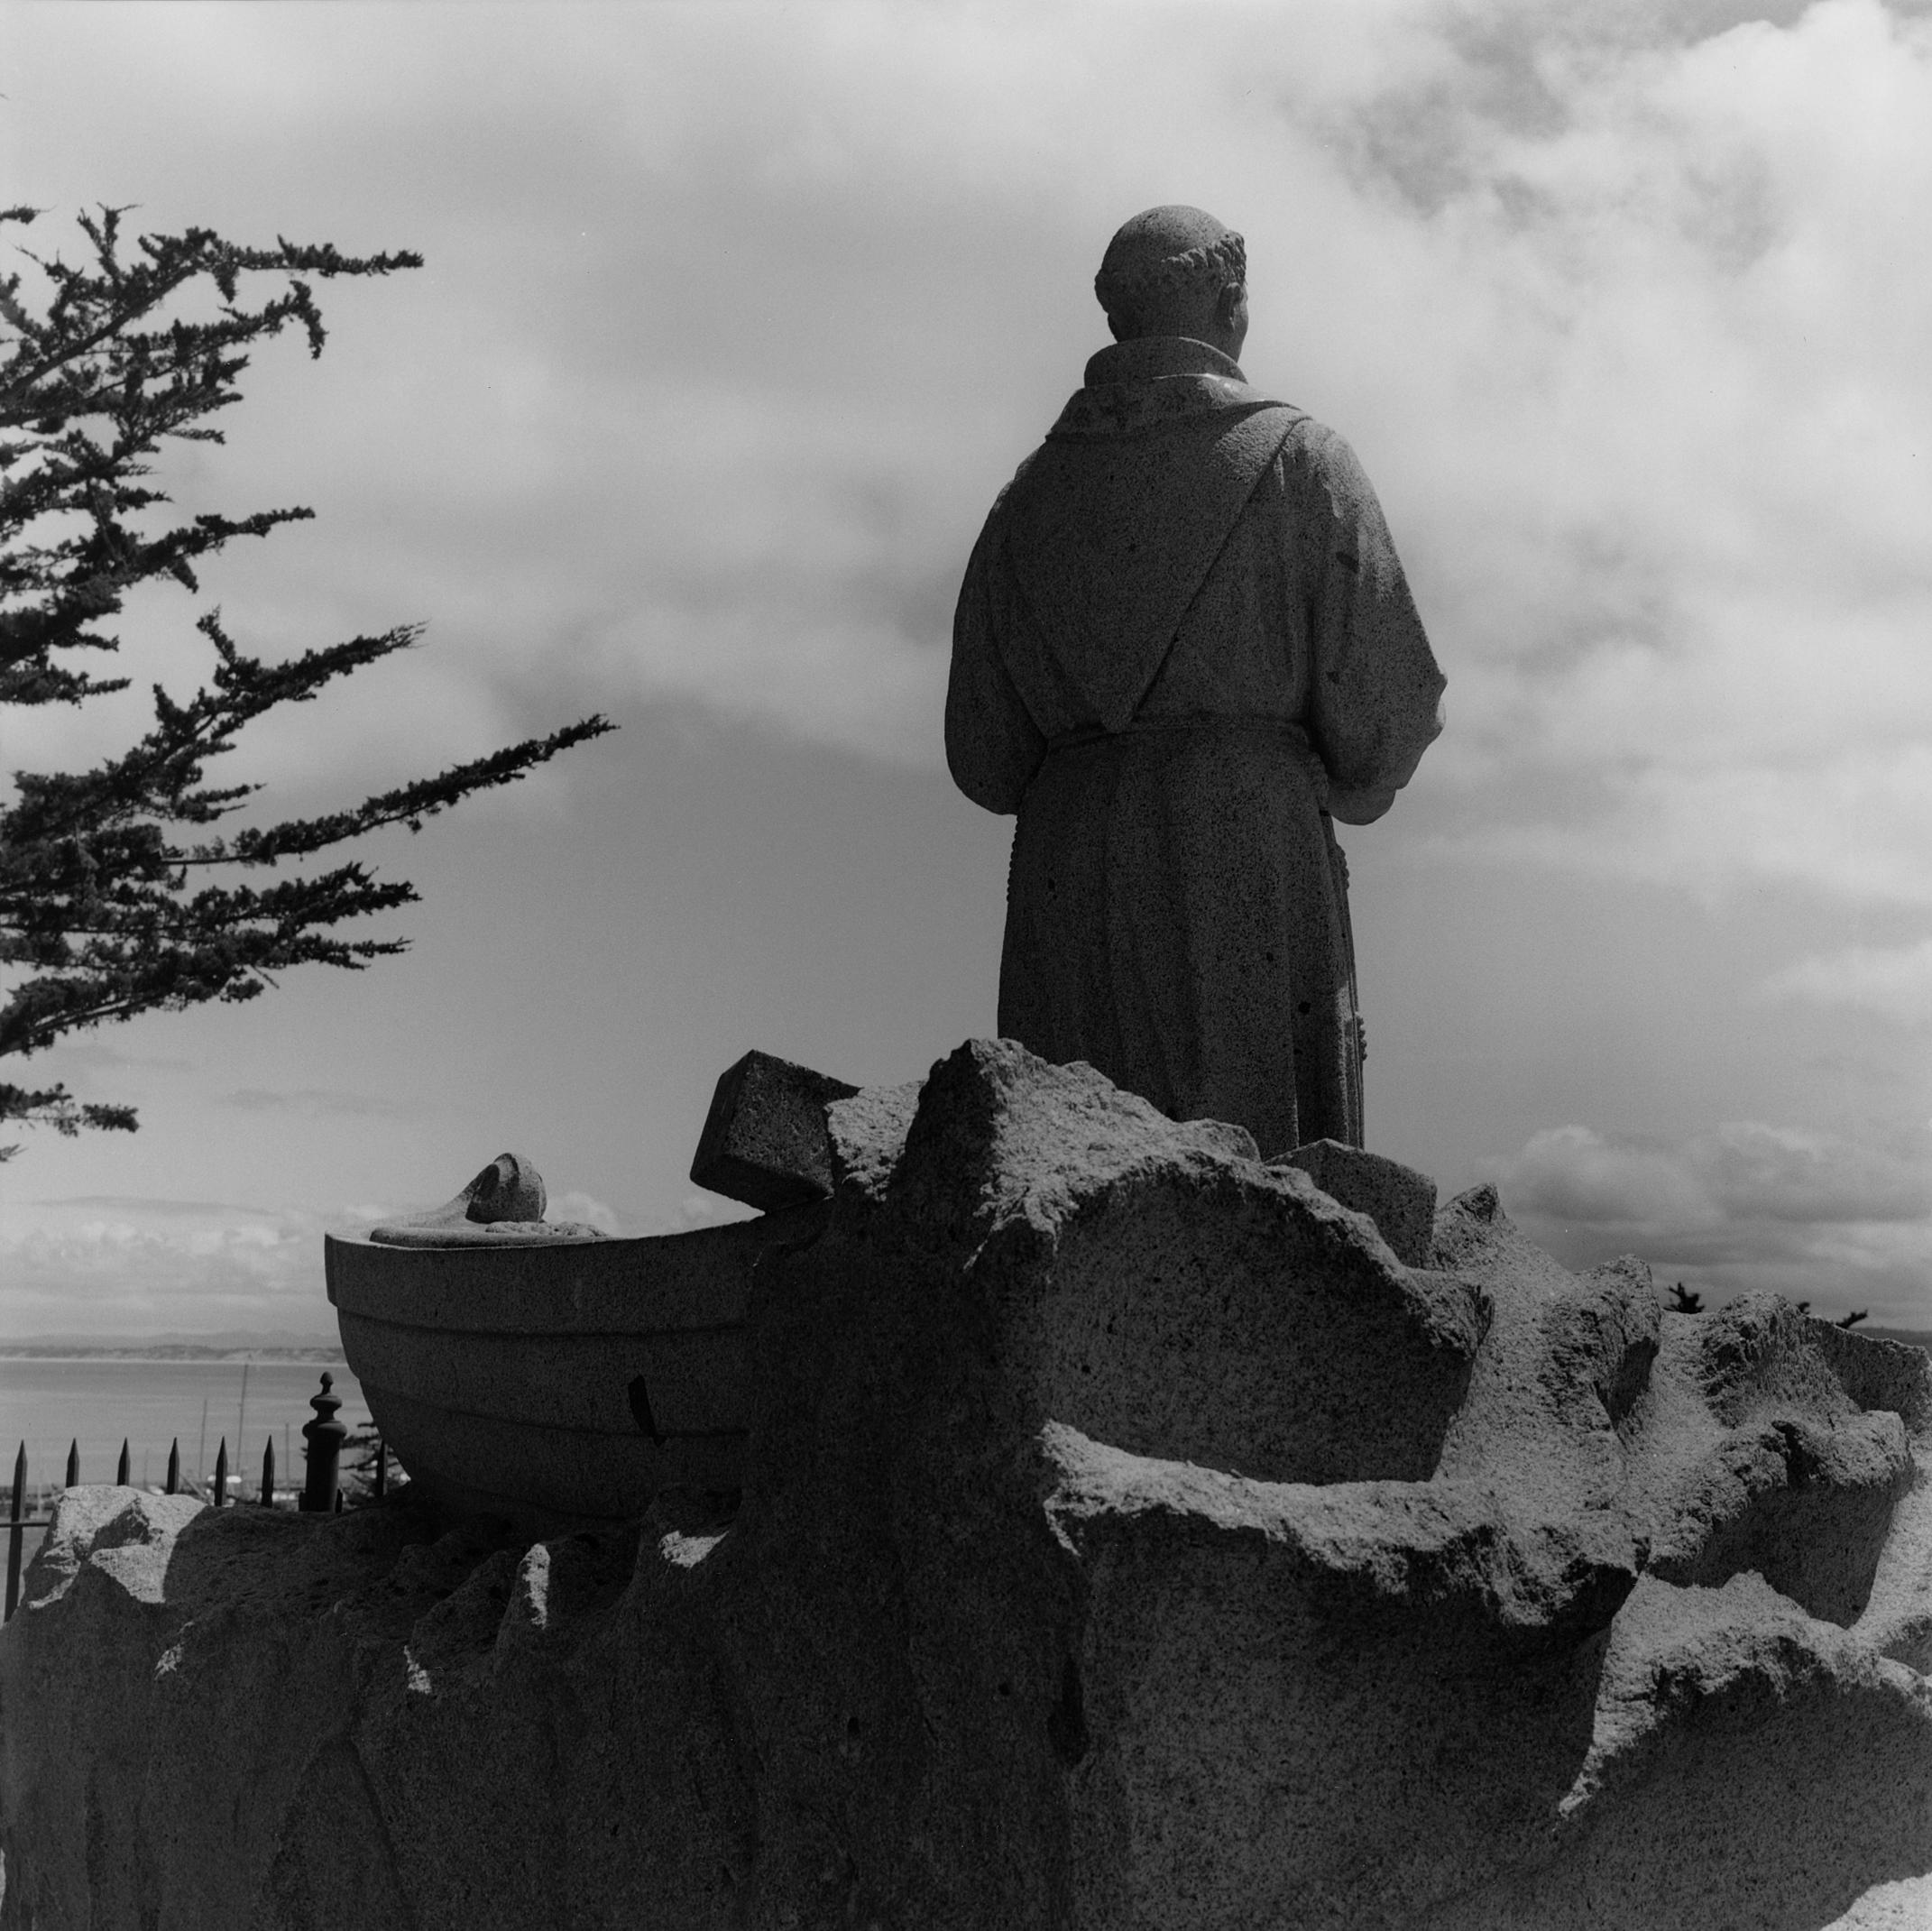 Father Serra, California, 2015